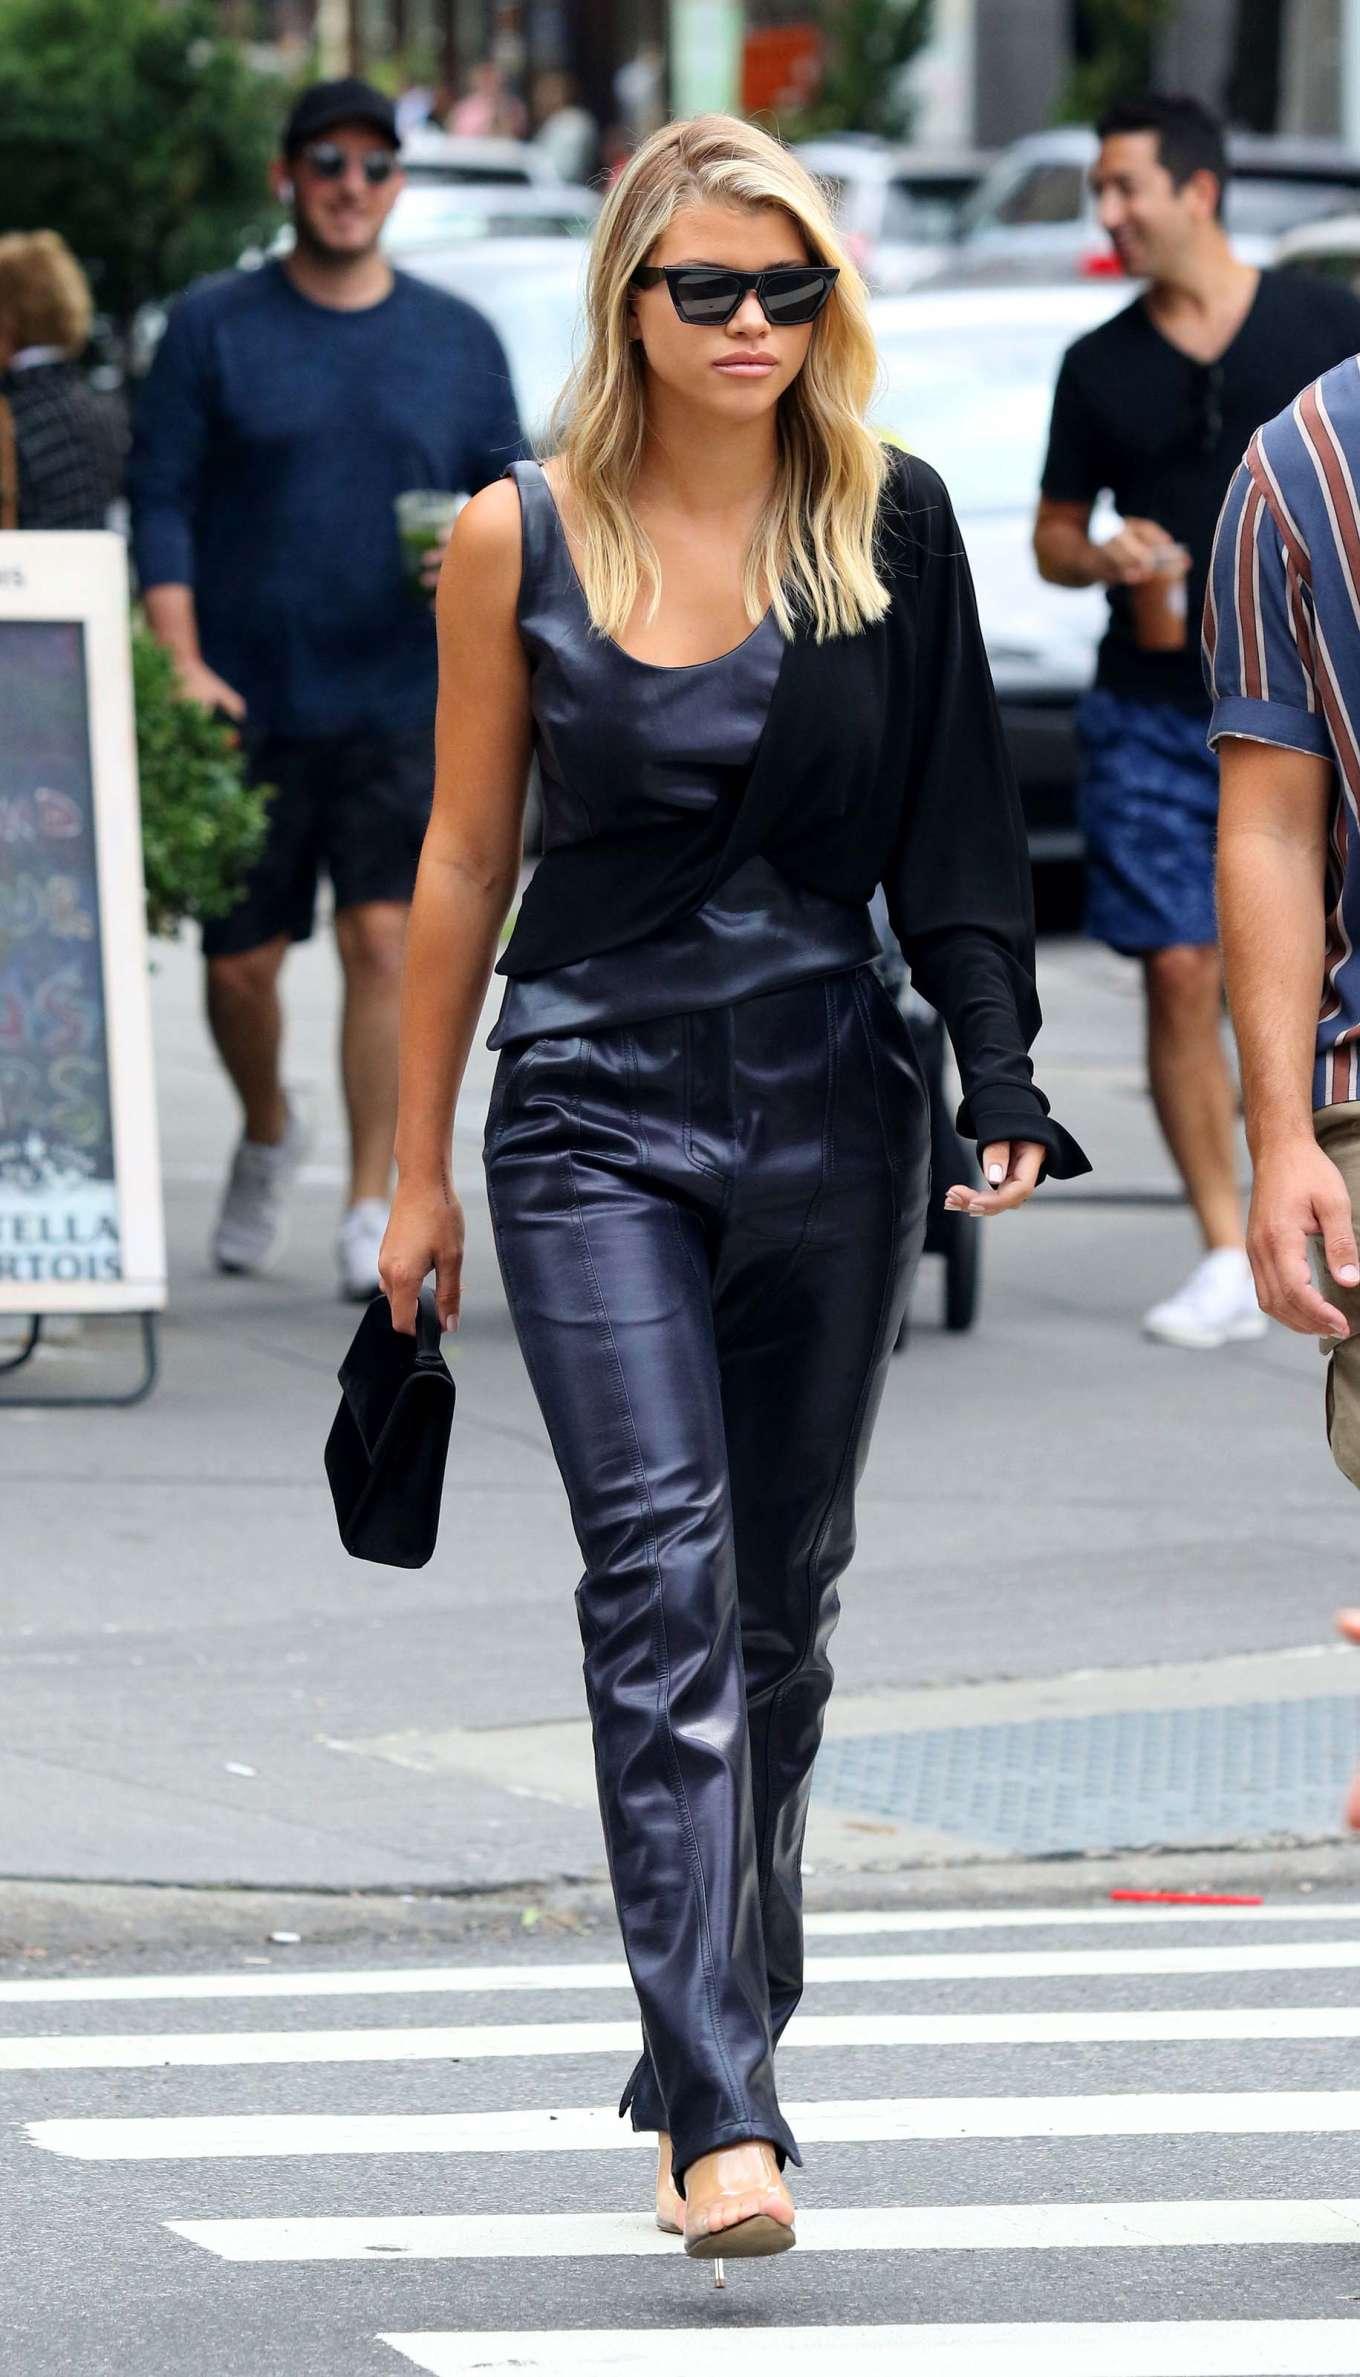 Sofia Richie - Shopping in Manhattan's Soho area in New York